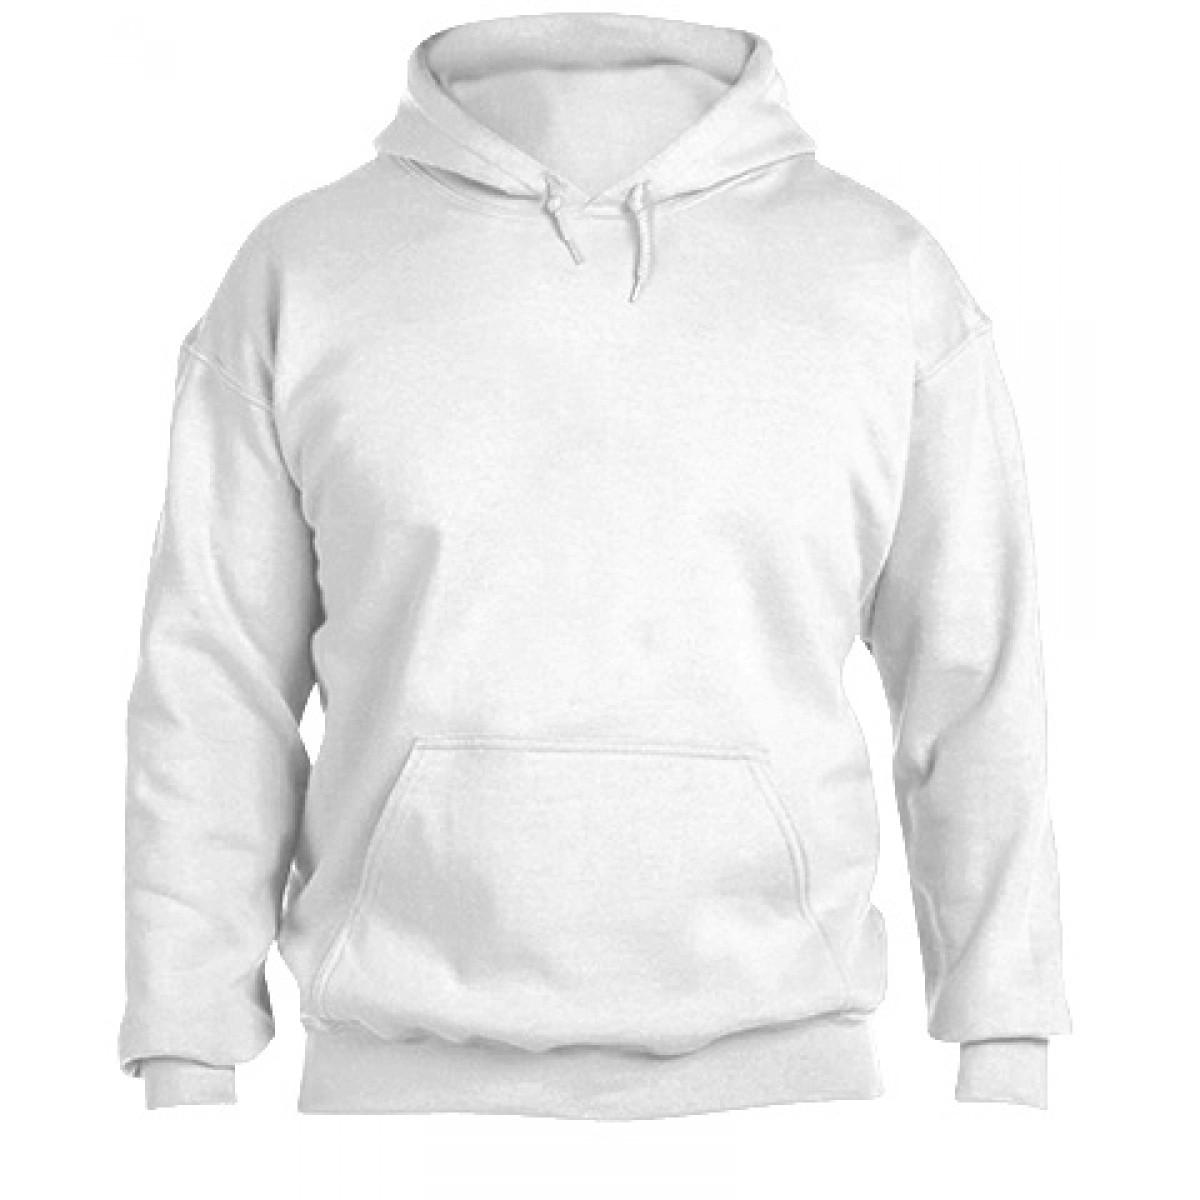 Hooded Sweatshirt 50/50 Heavy Blend-White-M